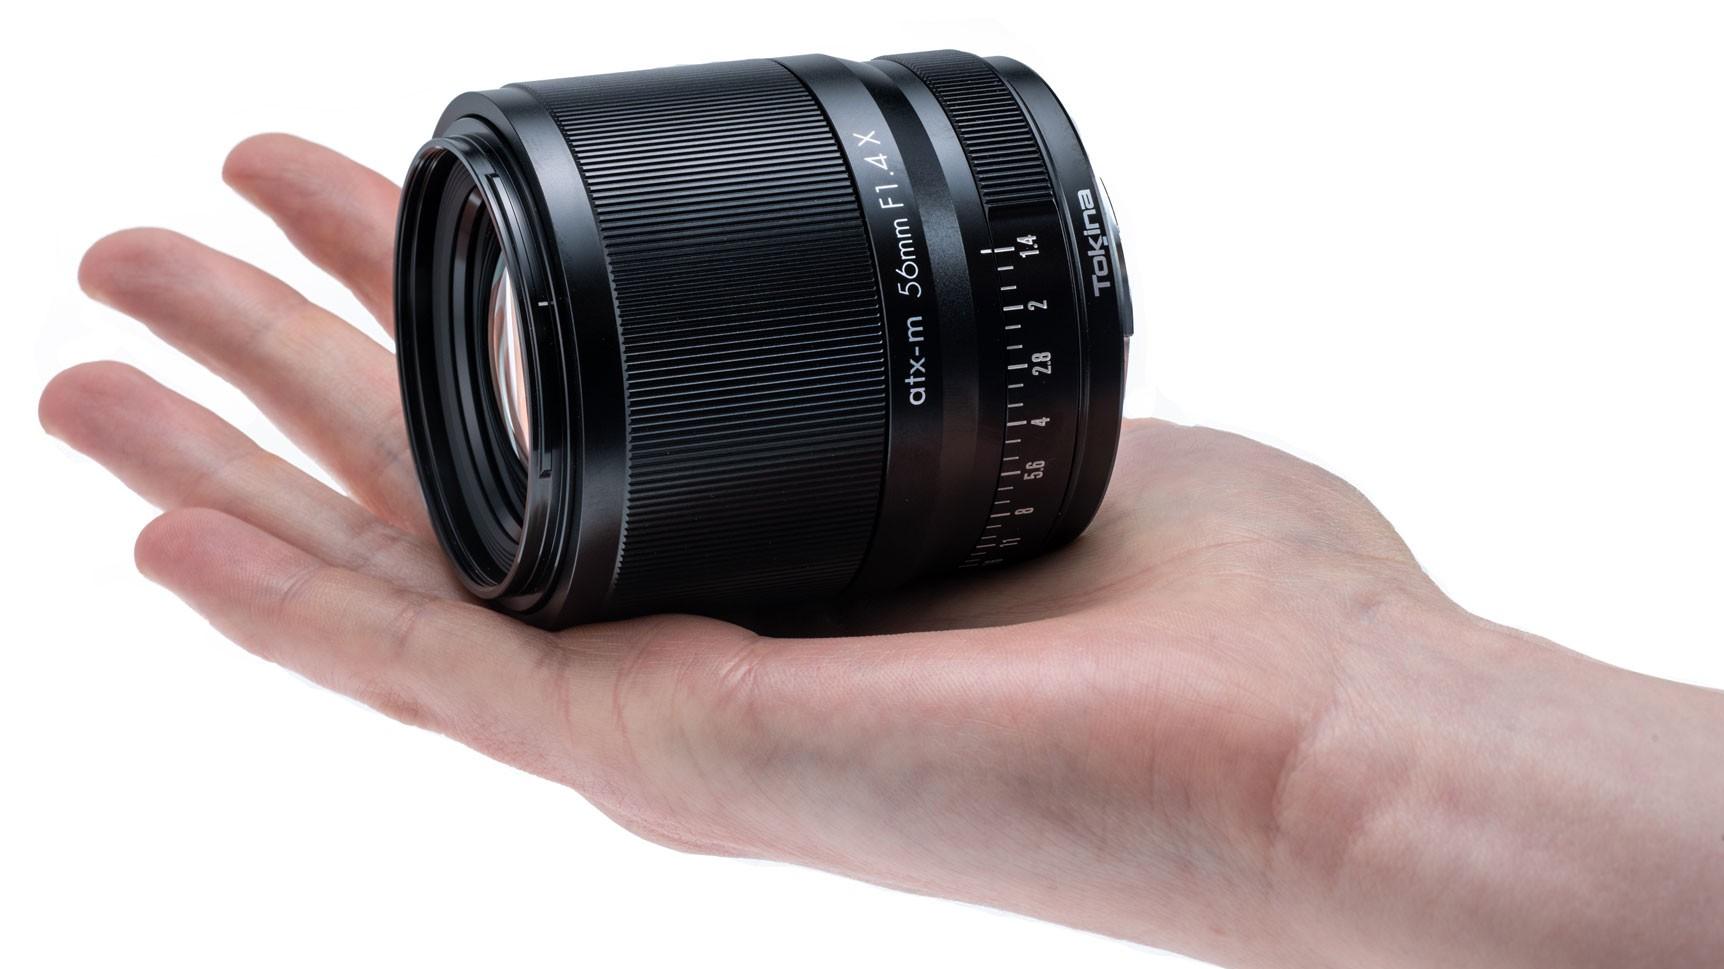 Объектив Tokina atx-m 56mm f/1.4 X  в руке